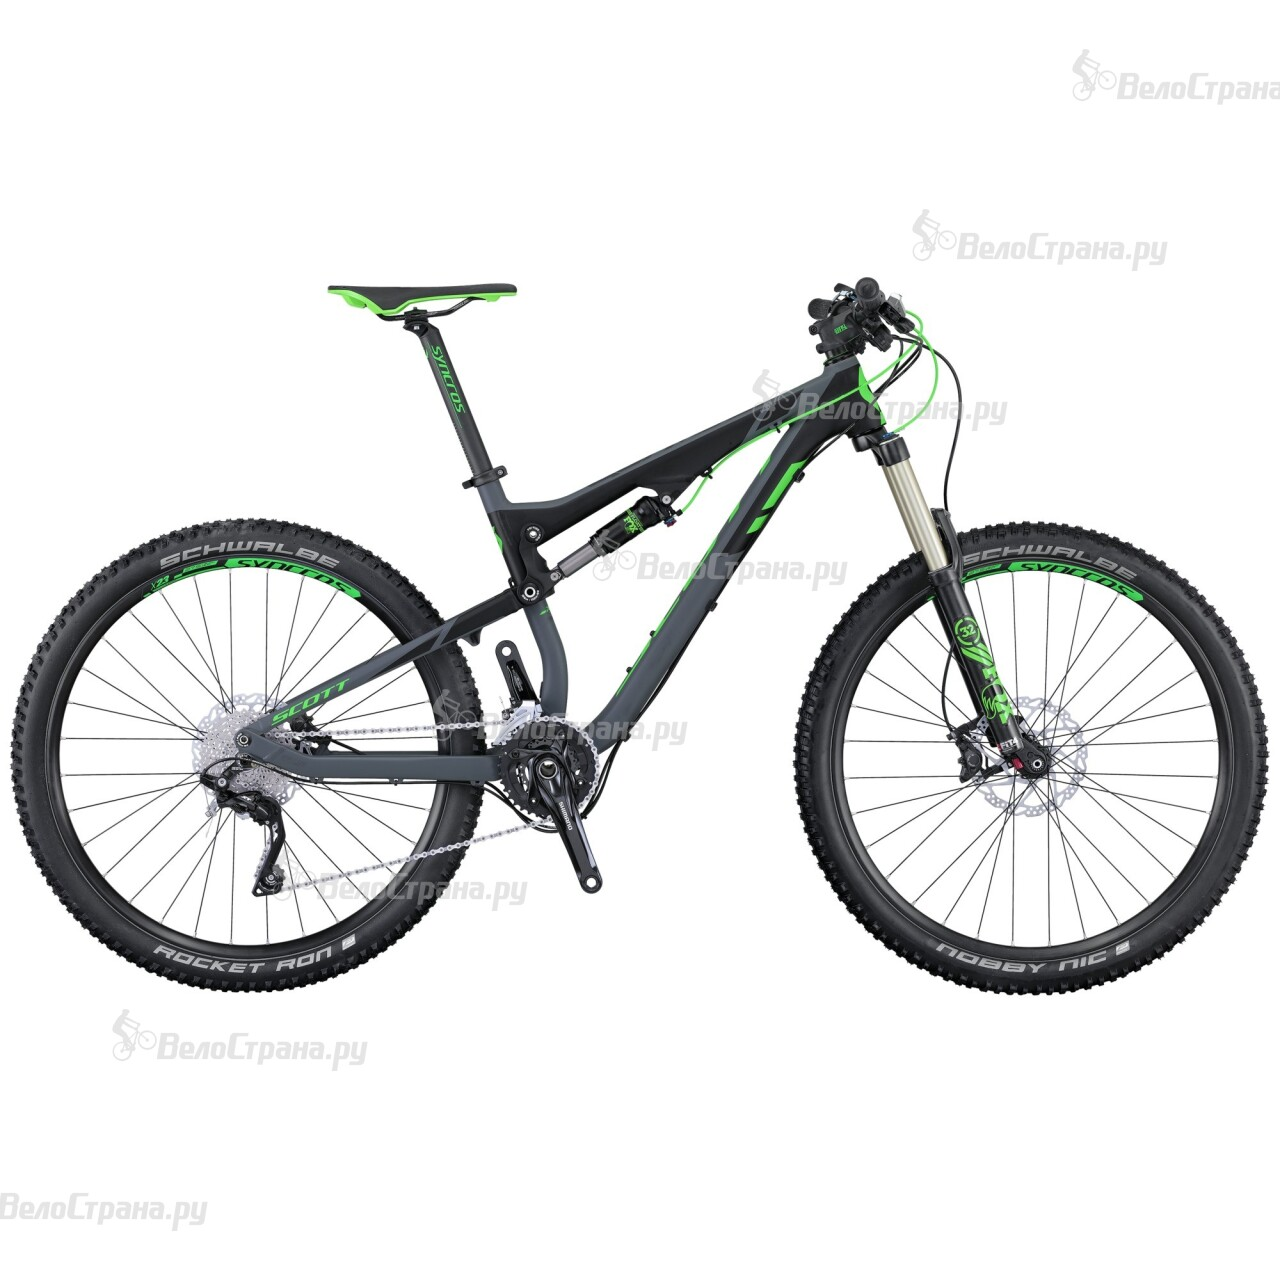 Велосипед Scott Genius 940 (2016) genius hs 300a silver